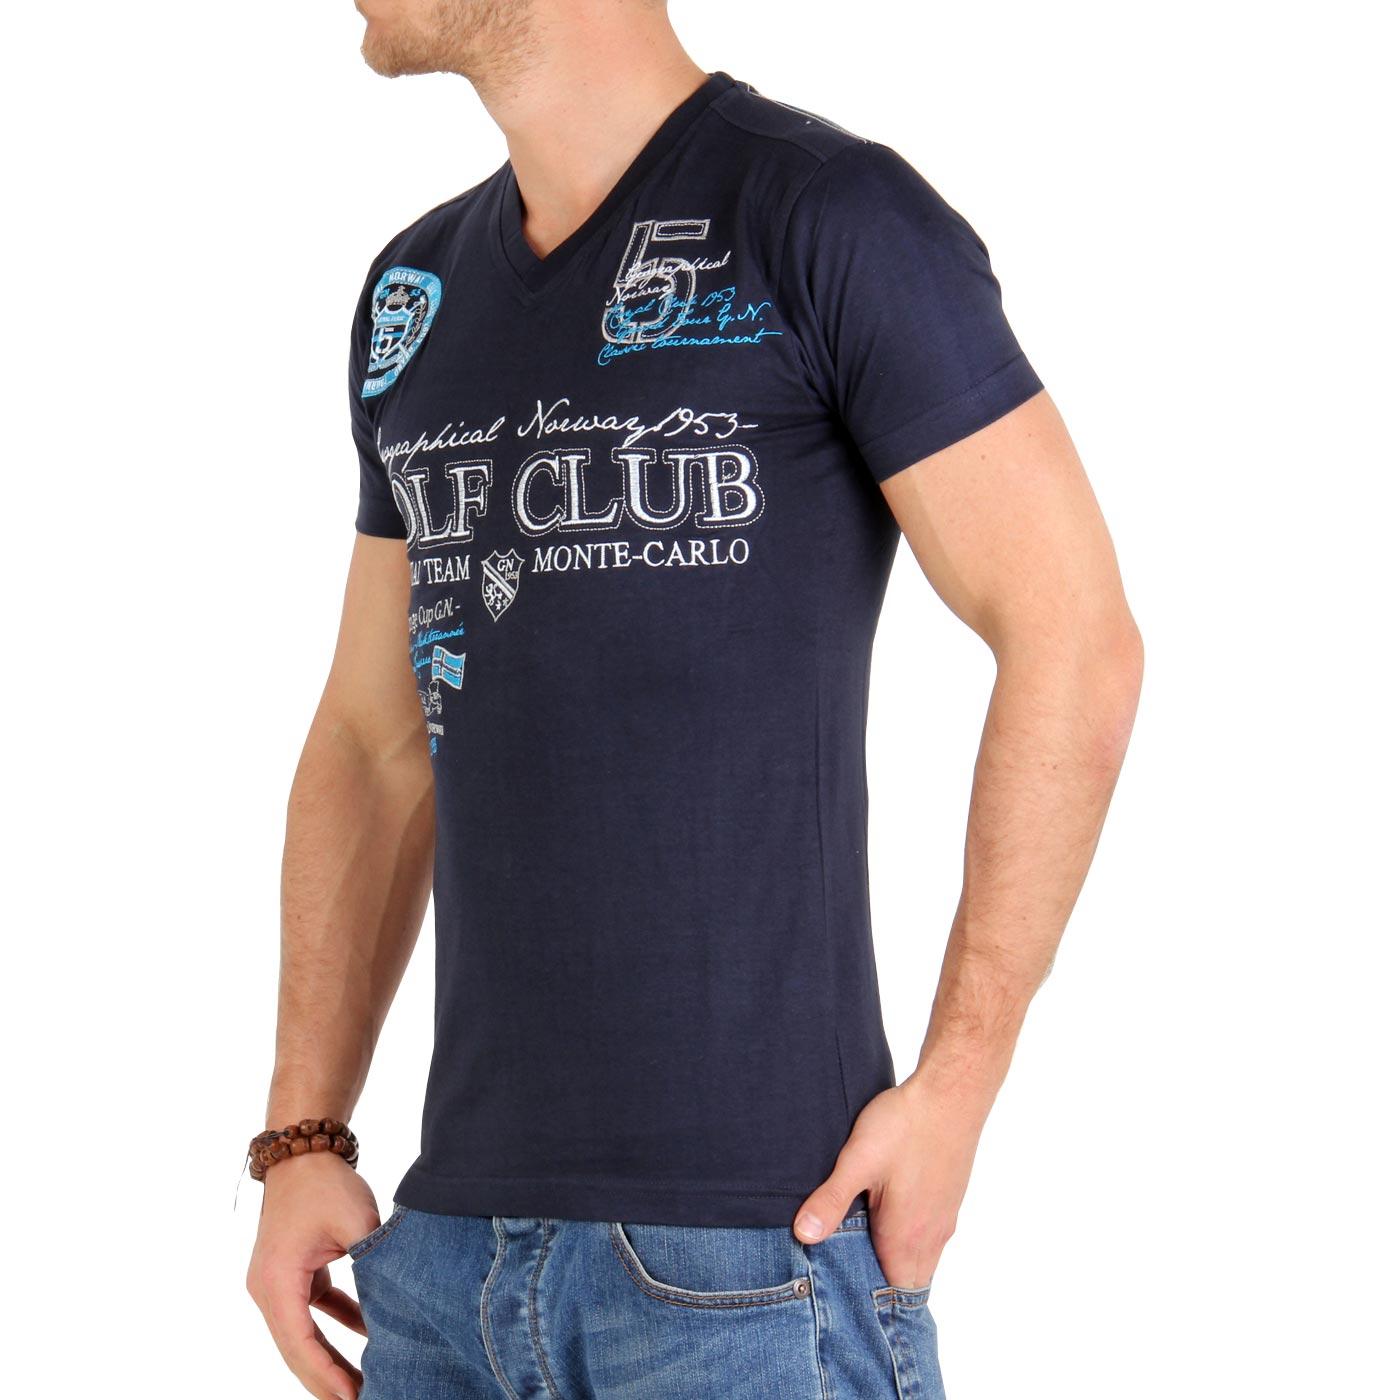 57293b8743660b T-shirt Druck Entfernen: November 2012